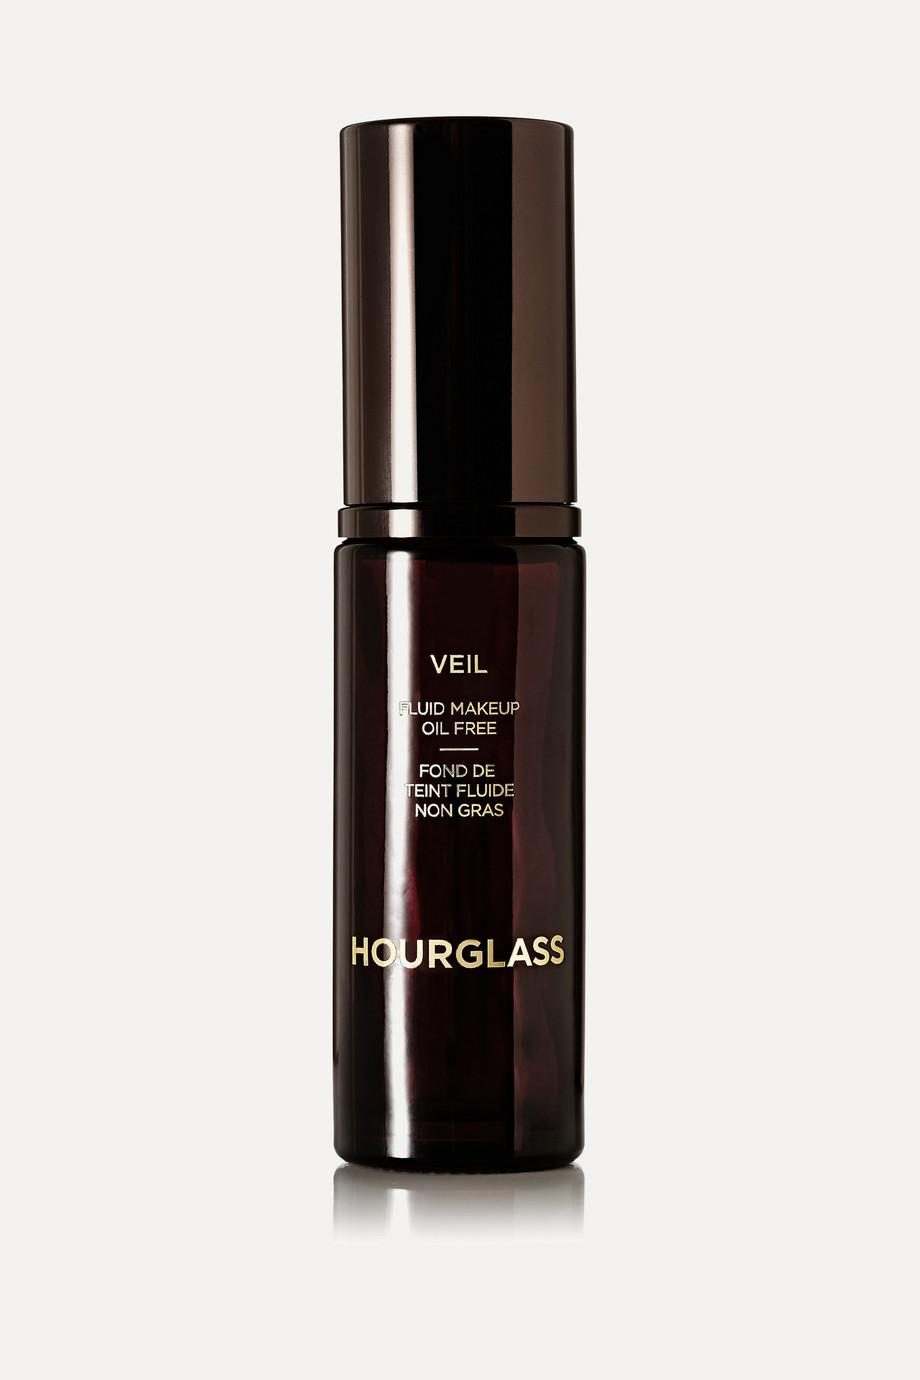 Hourglass Veil Fluid Makeup No 1 – Ivory, 30ml – Foundation